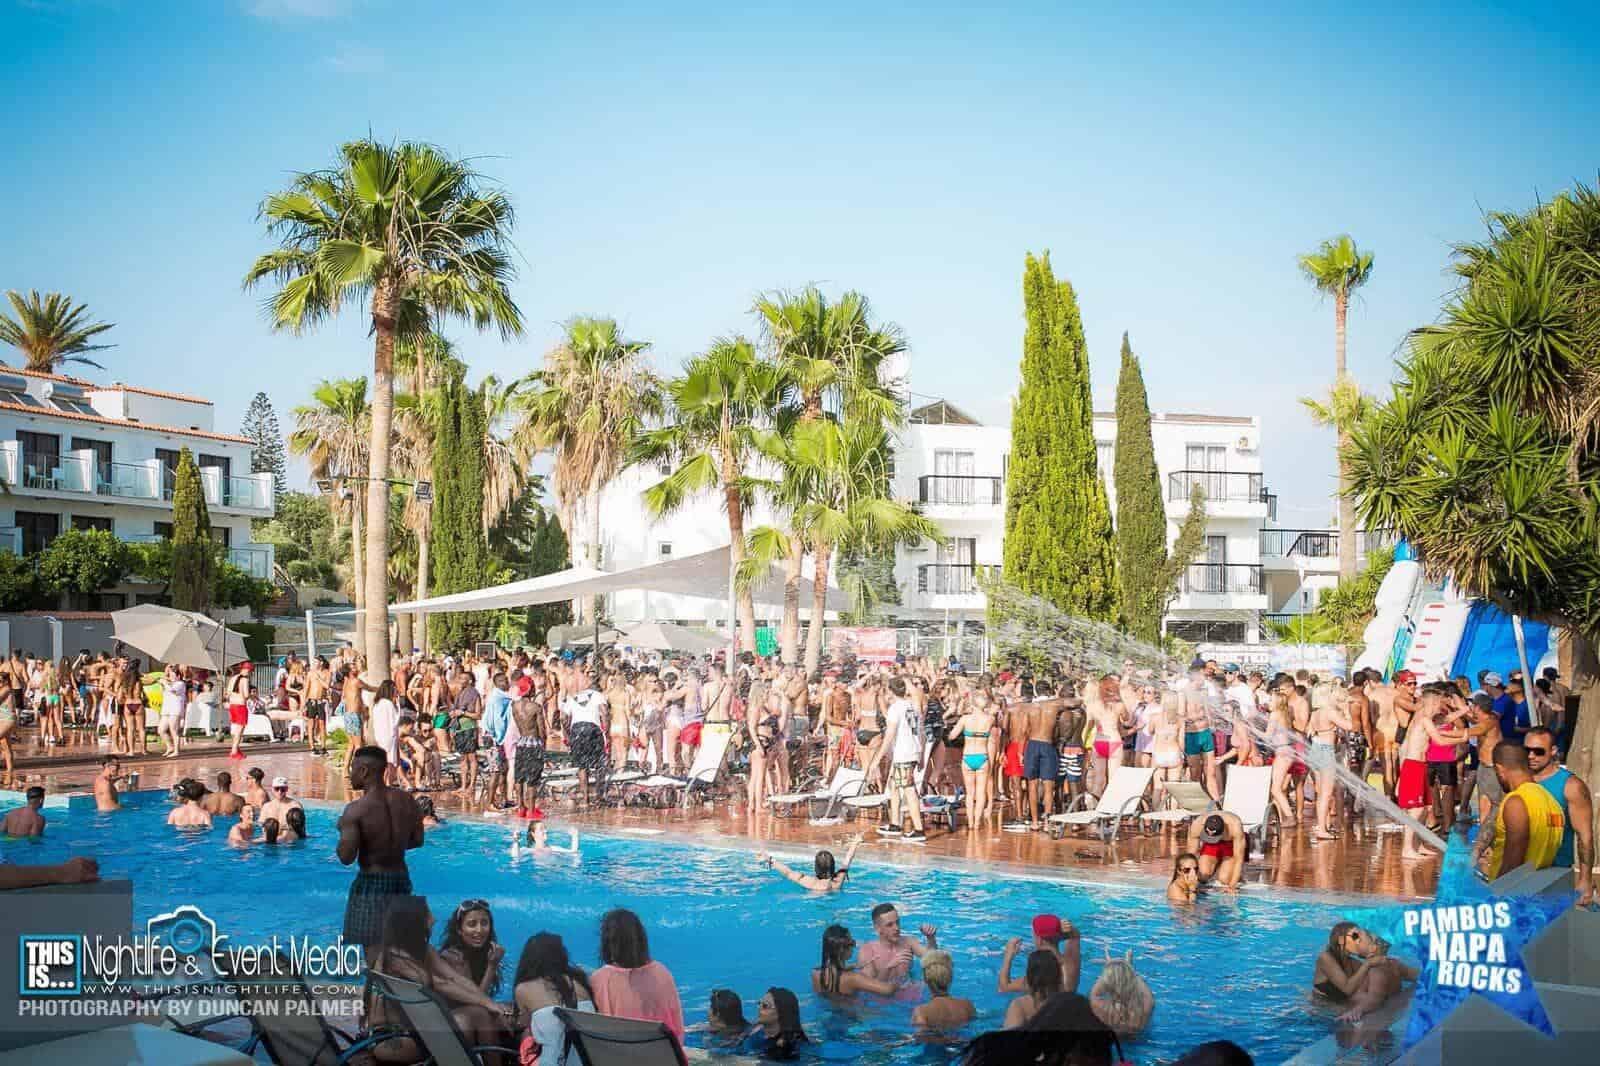 napa rocks pool party in ayia napa cyprus